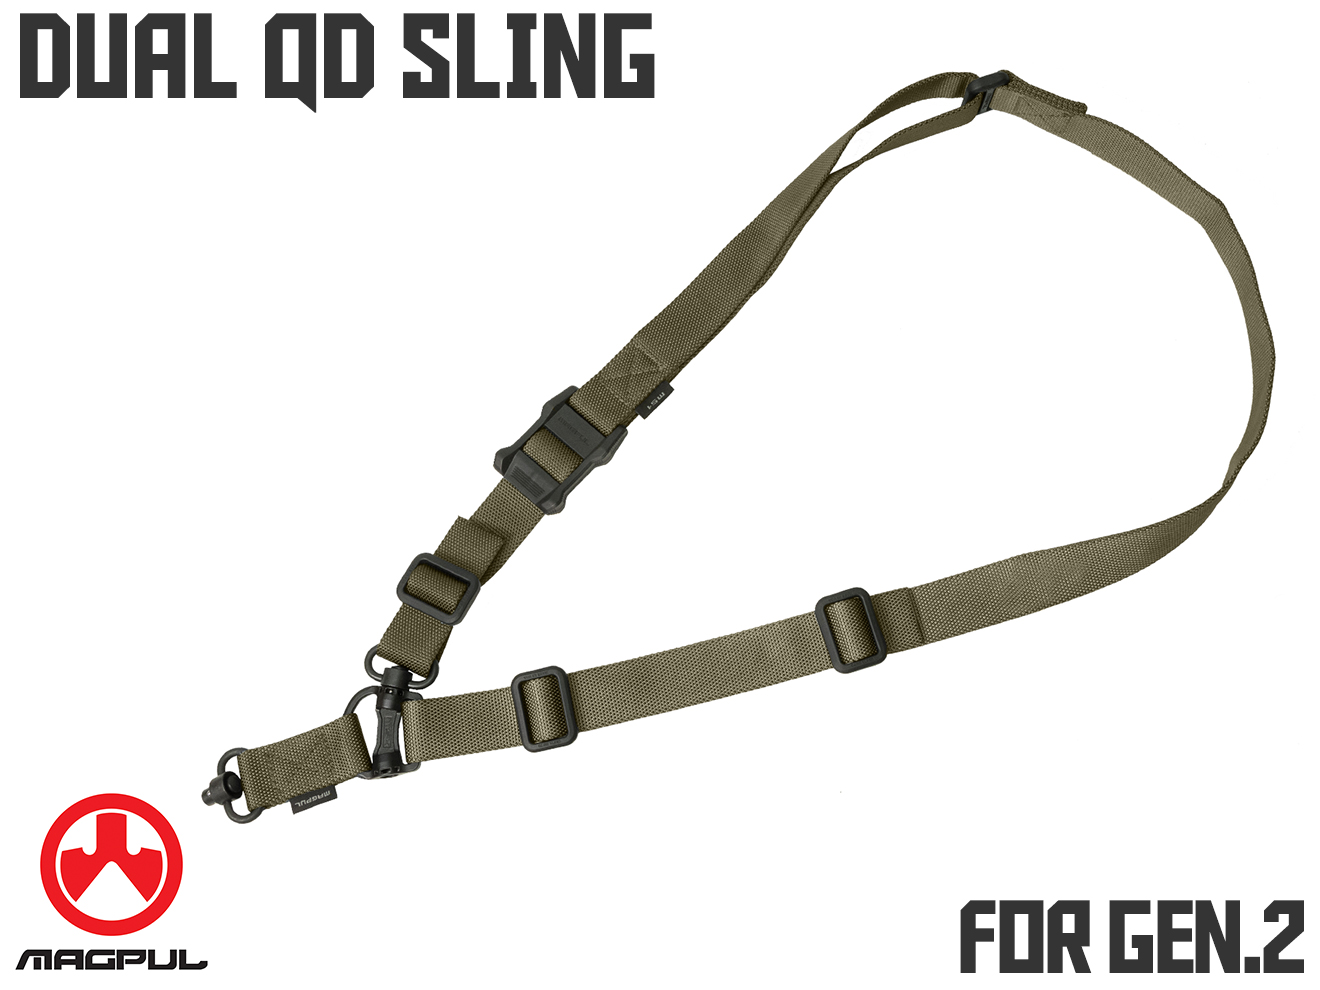 MAGPUL MS4 デュアル QD GEN.2 スリング Ranger Green◆マグプル正規品 MA510430359 シングル/ マルチポイント QDスイベル装備 約172cm